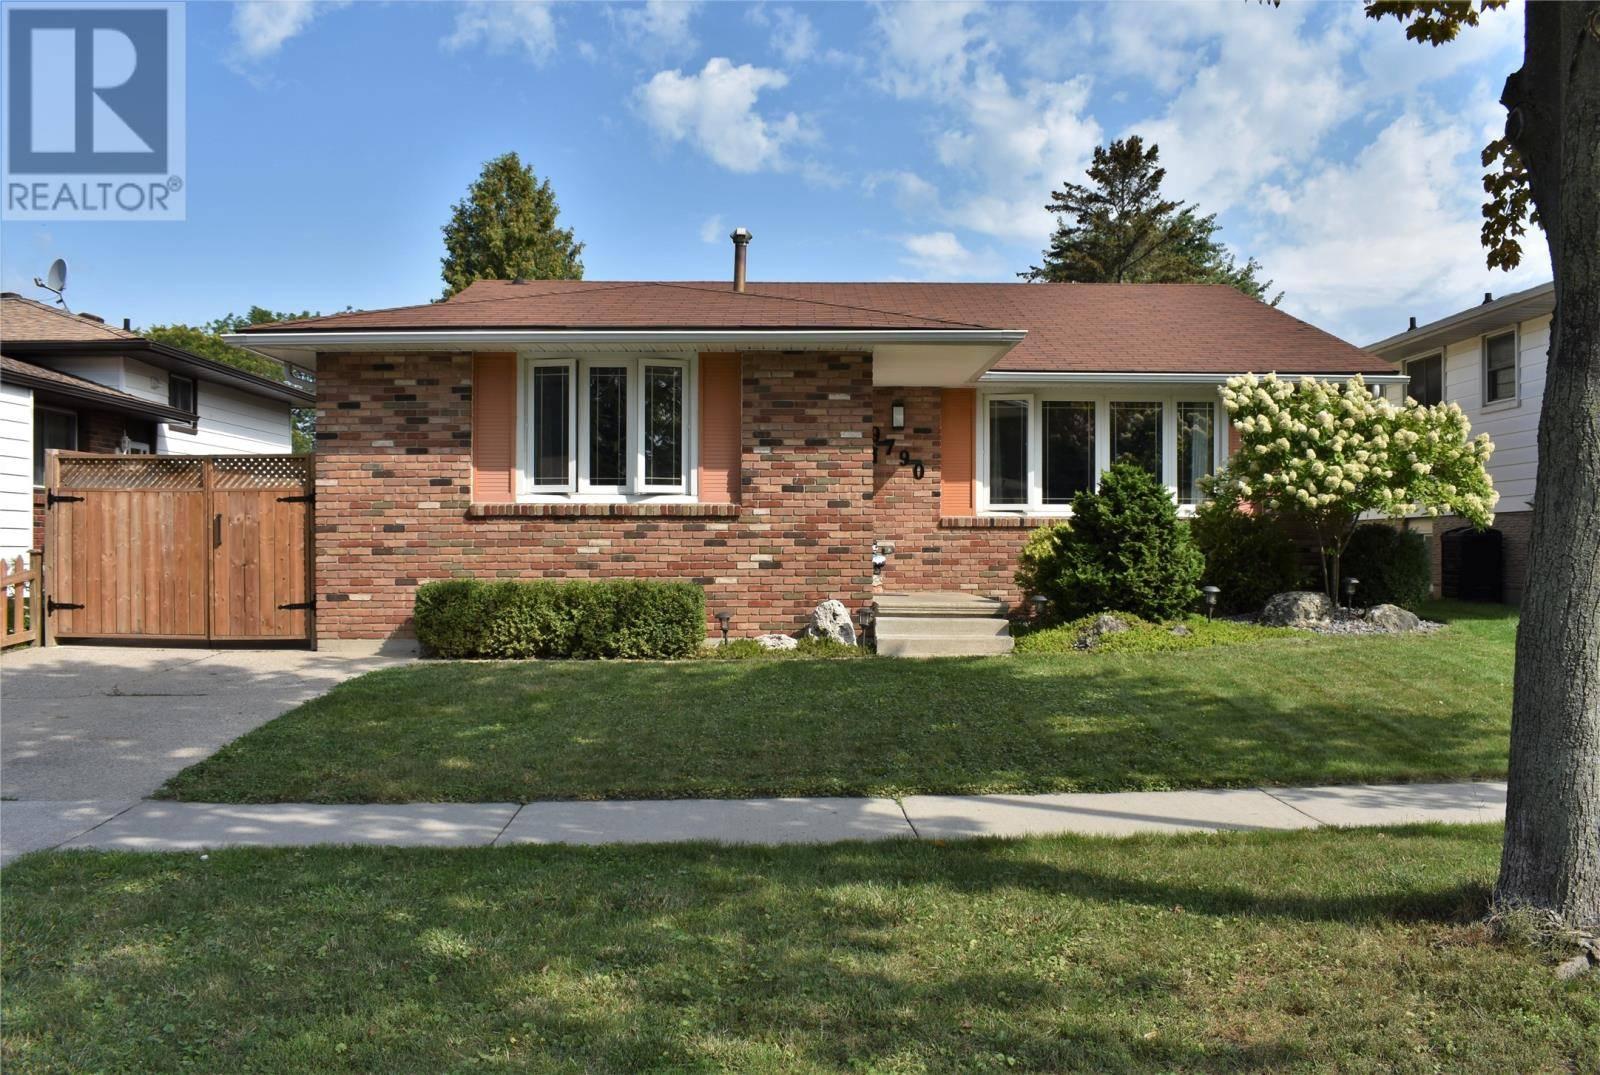 House for sale at 9790 Ridge  Windsor Ontario - MLS: 19024942